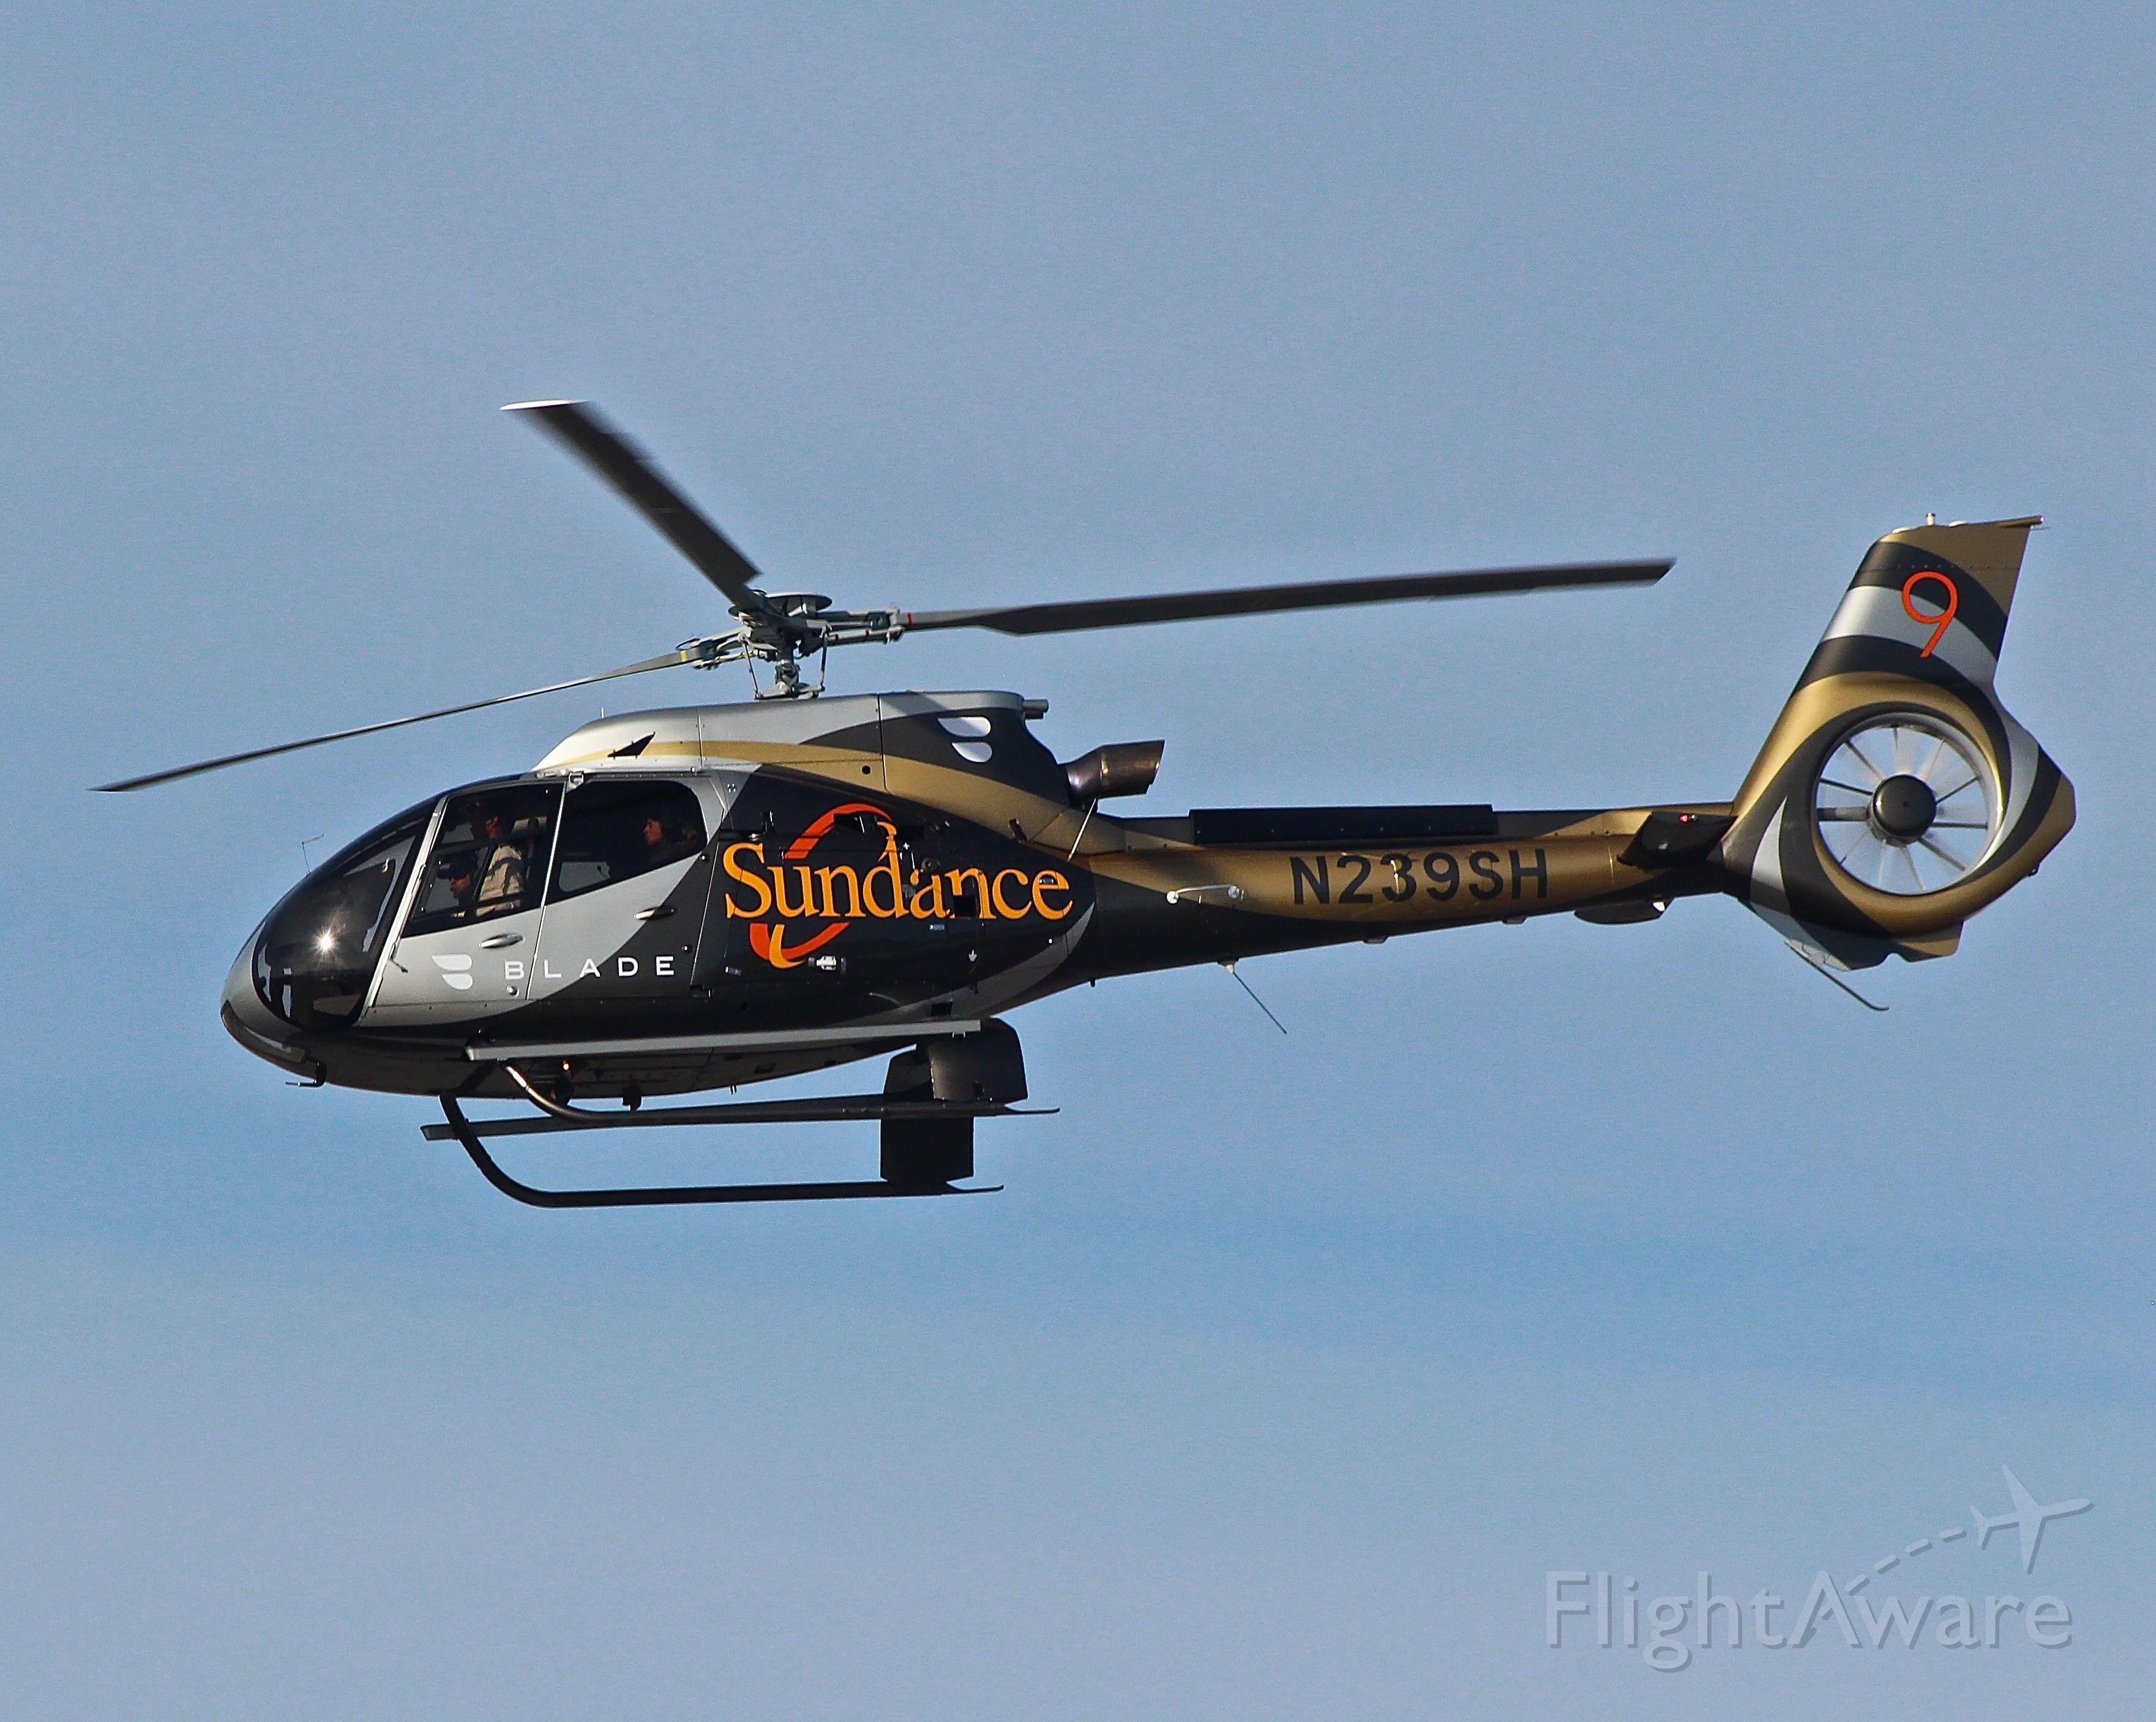 Experimental >200kts (N239SH) - Sundance Helicopters N239SH Eurocopter EC-130 departs Salt Lake City International Airport, Utah en-route to Park City, Utah on the first Fly Blade flight to the Sundance Film Festival.